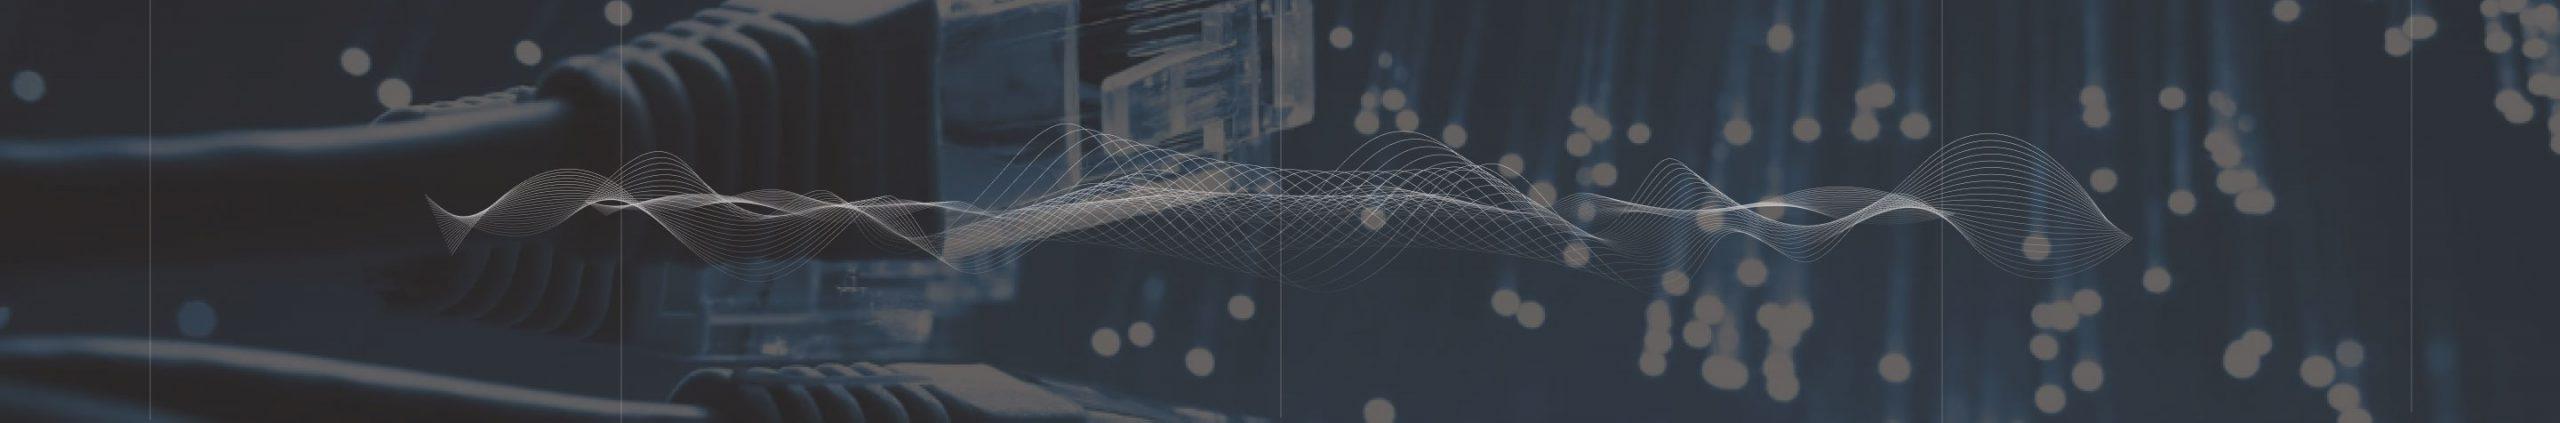 PoE  IoT Technologies